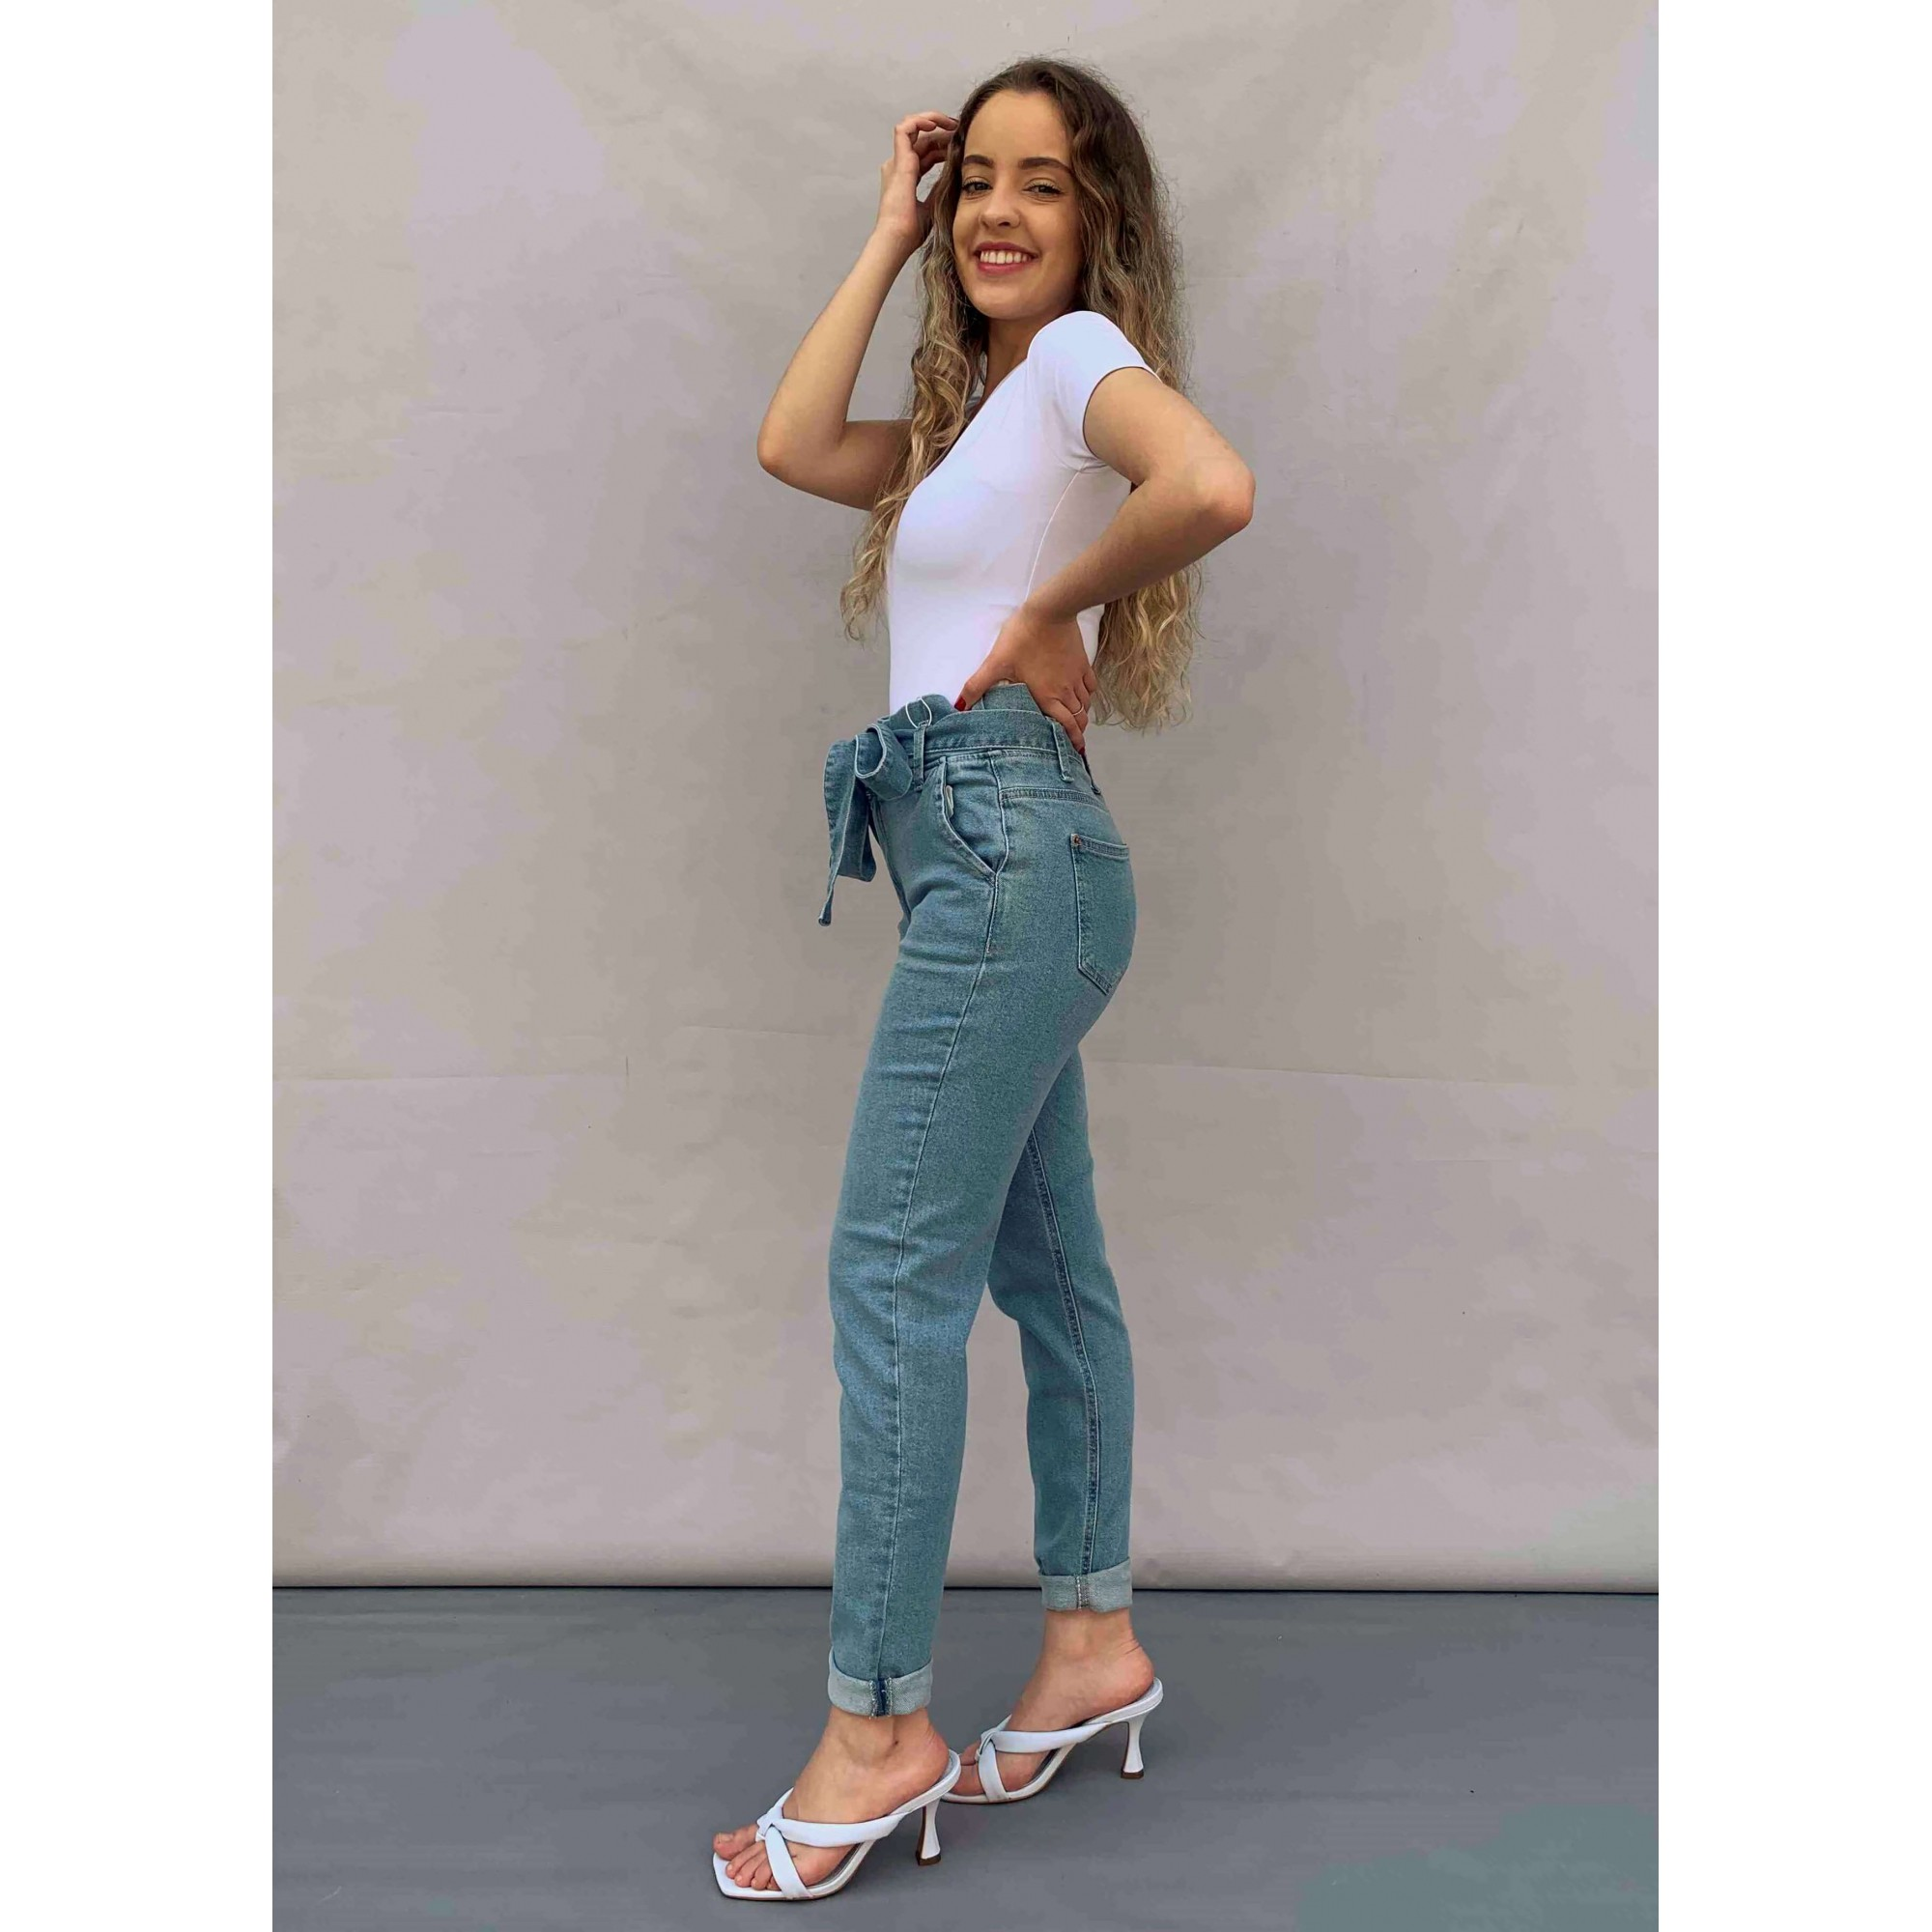 Clochard Jeans claro Visual Jeans  - Choque Concept